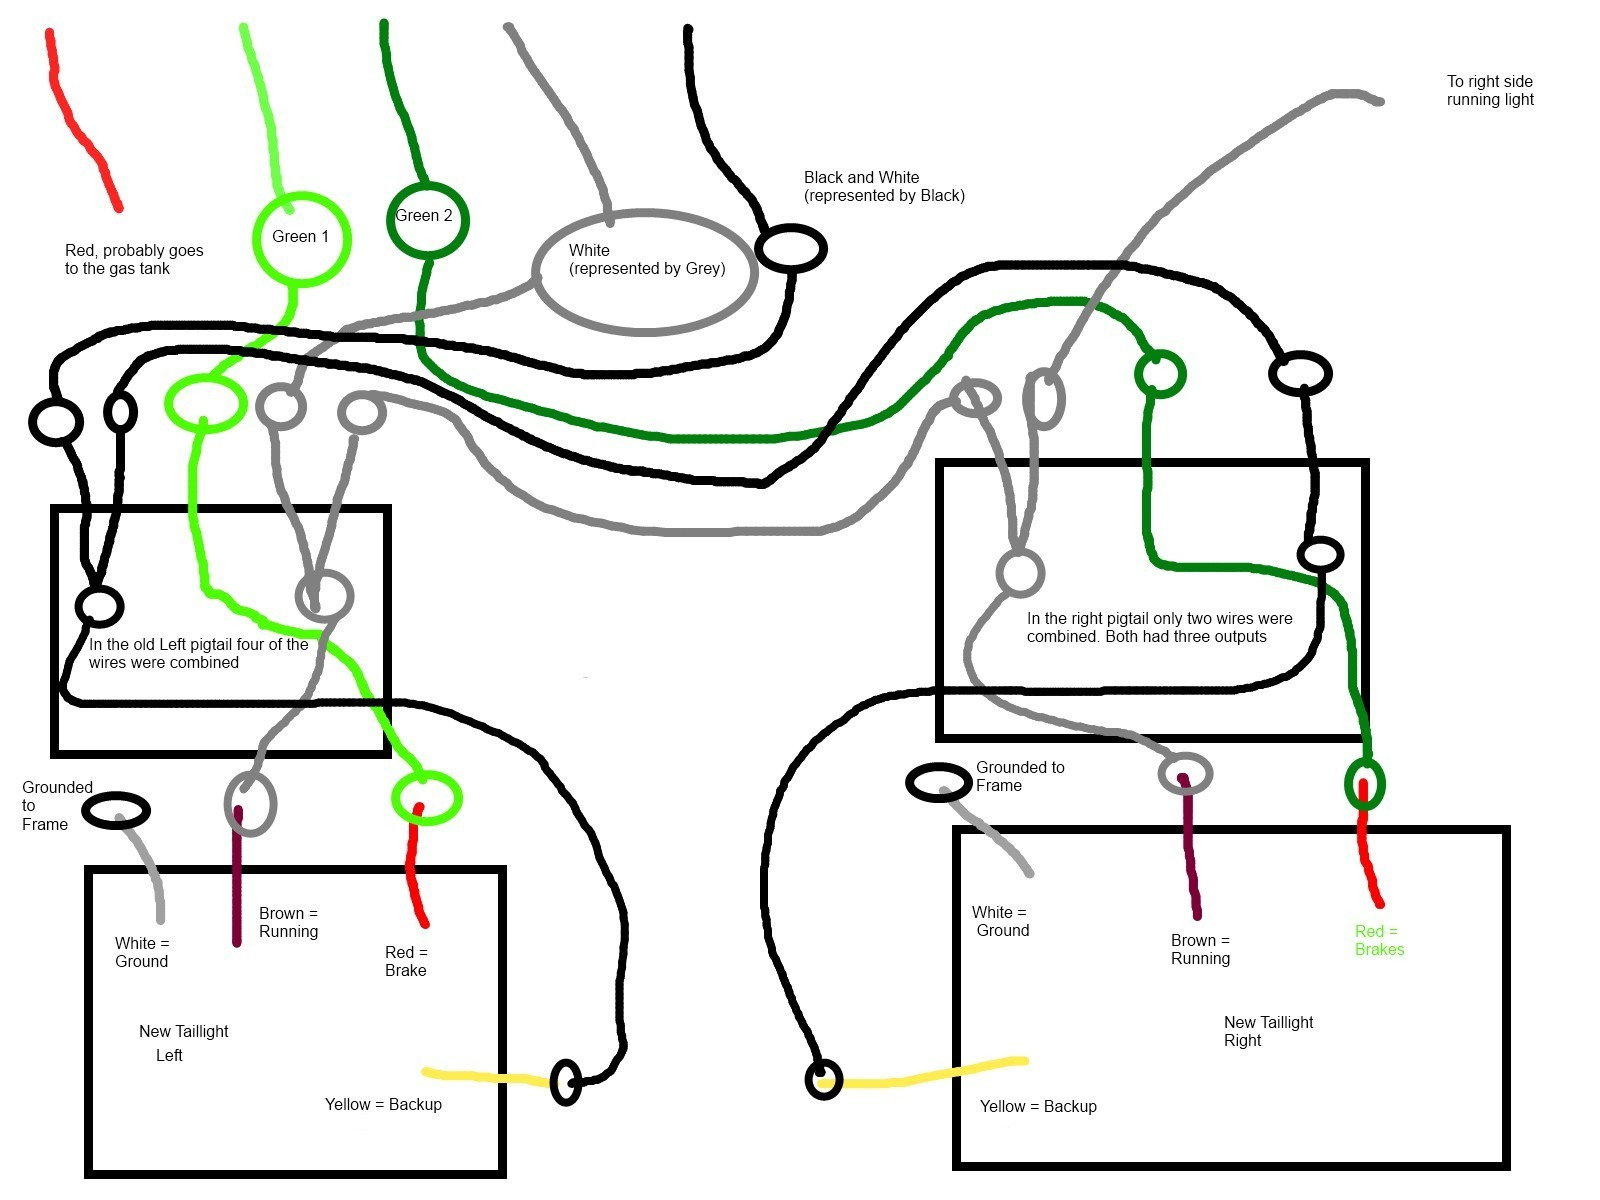 Nf 6816 Cj5 Heater Diagram Wiring Diagram